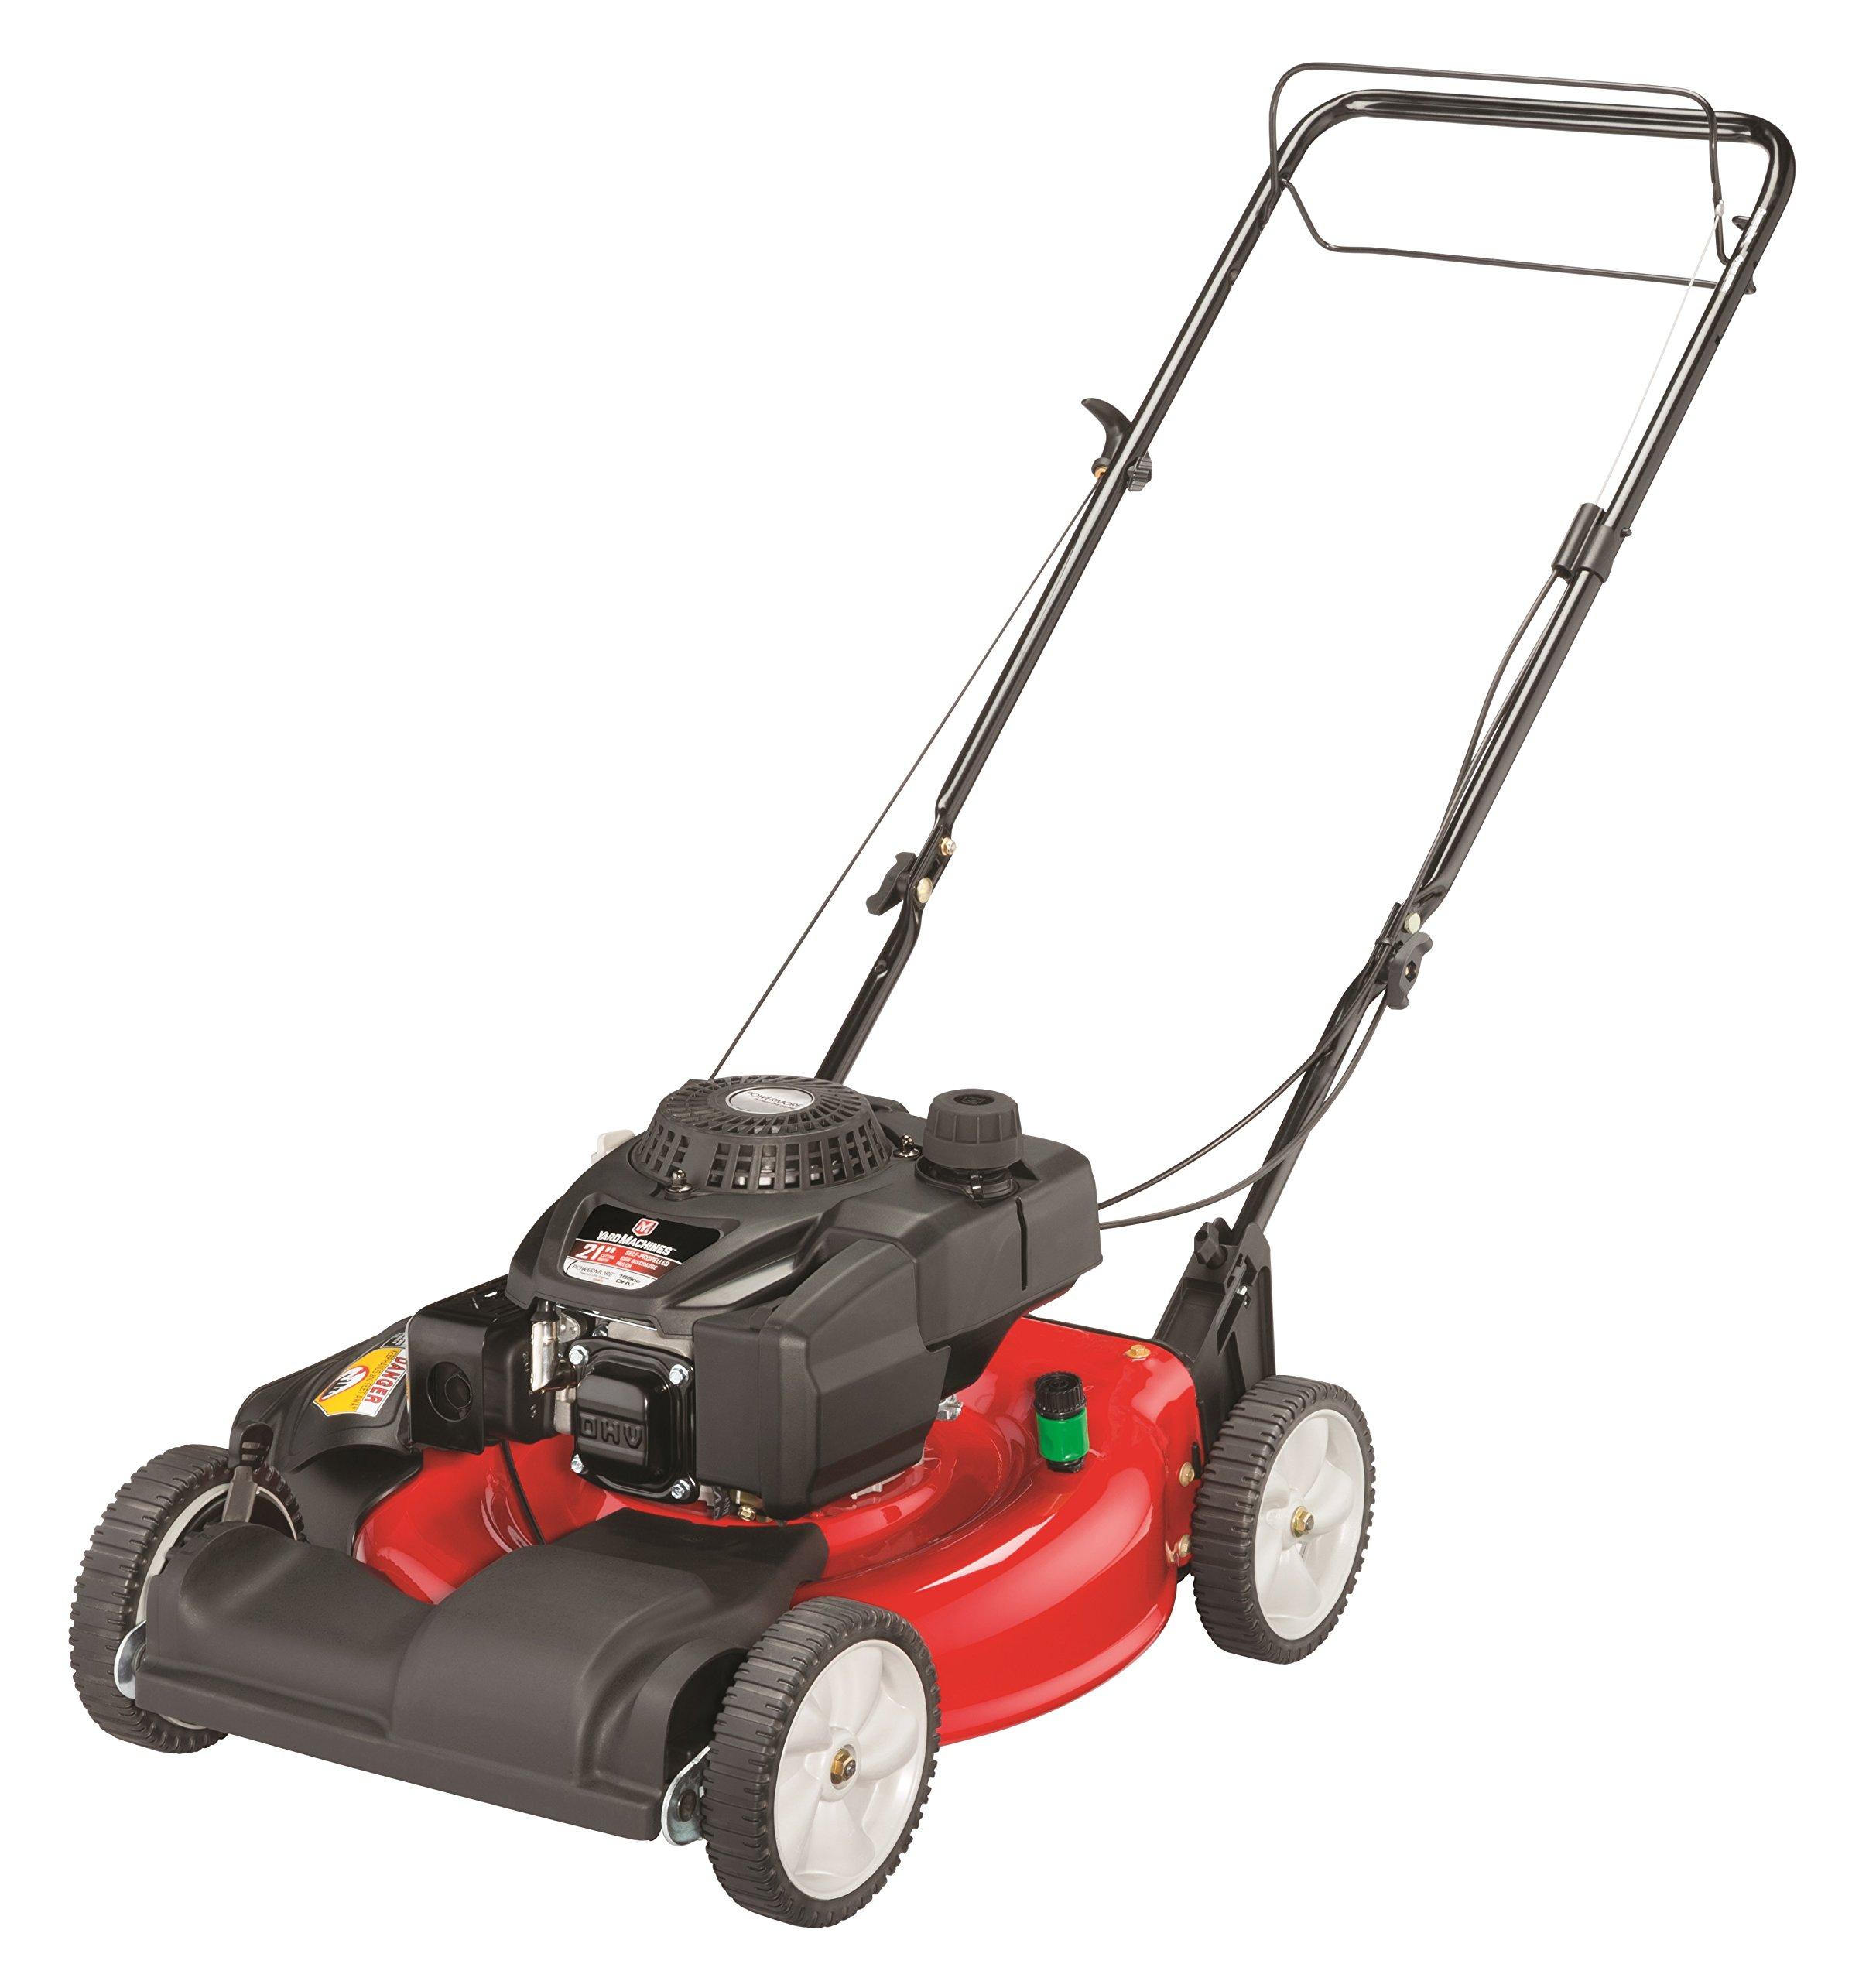 Yard Machines 159cc 21-Inch Self-Propelled Mower